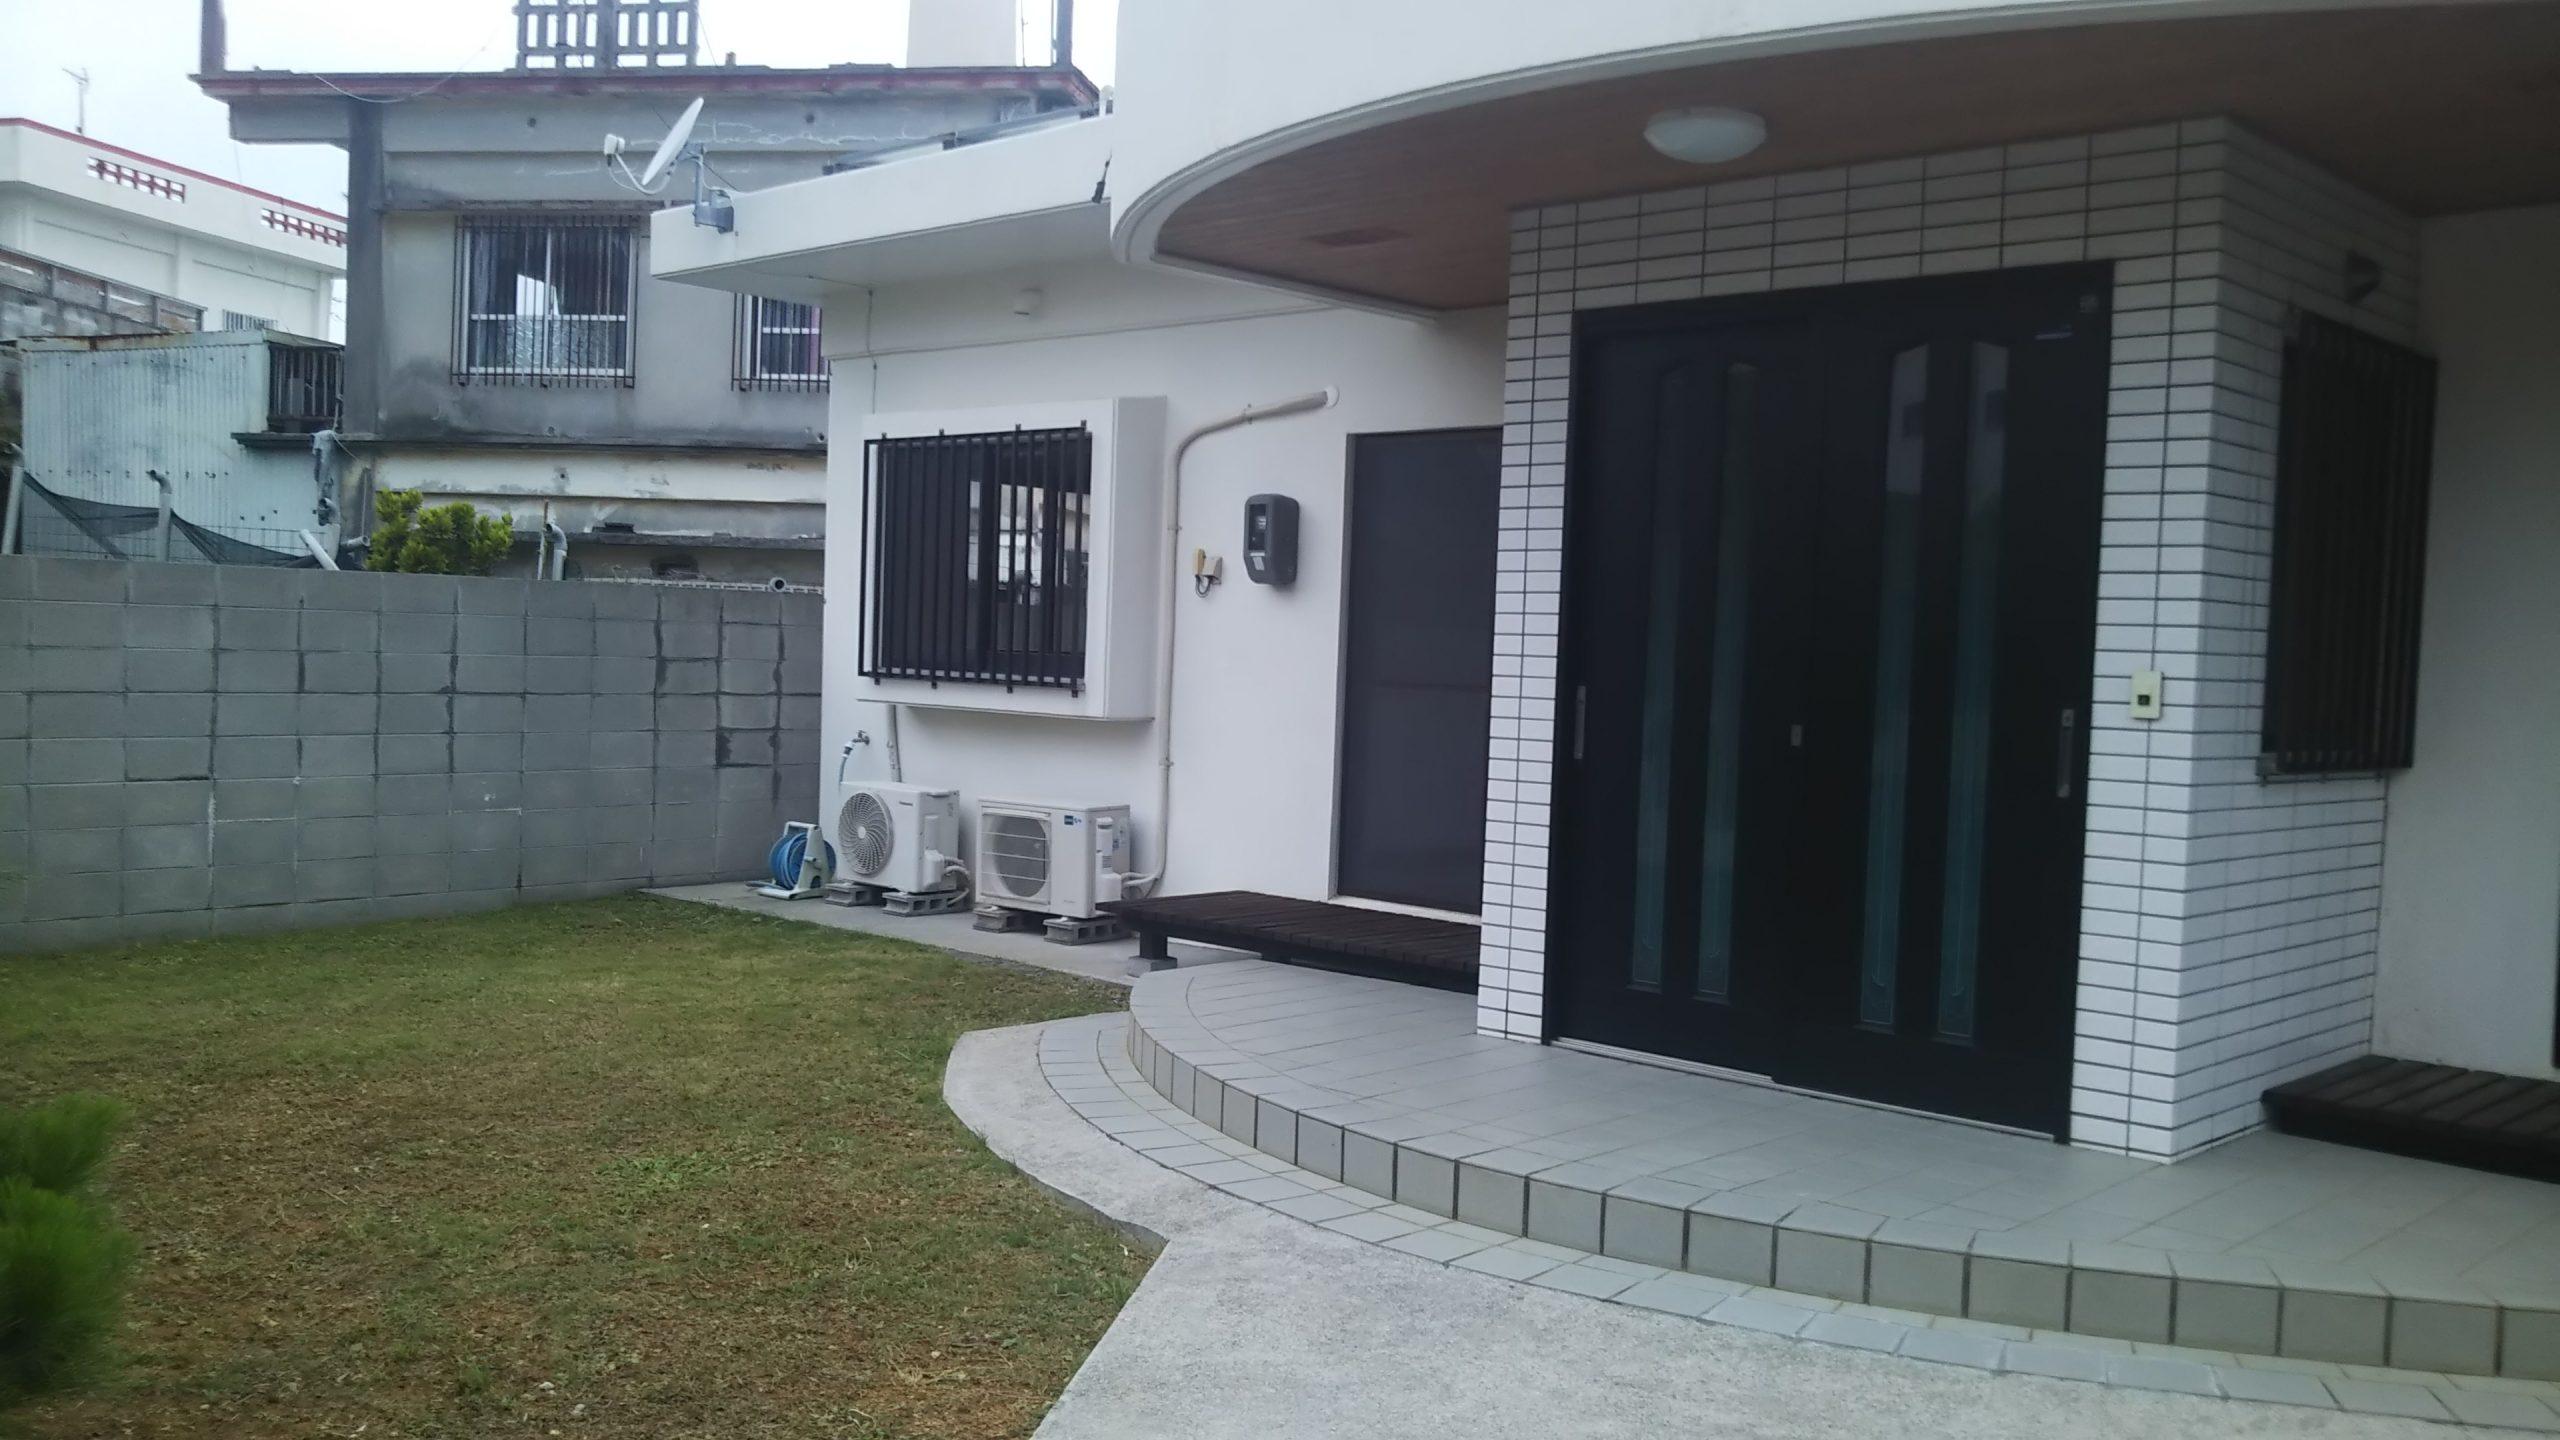 148 house